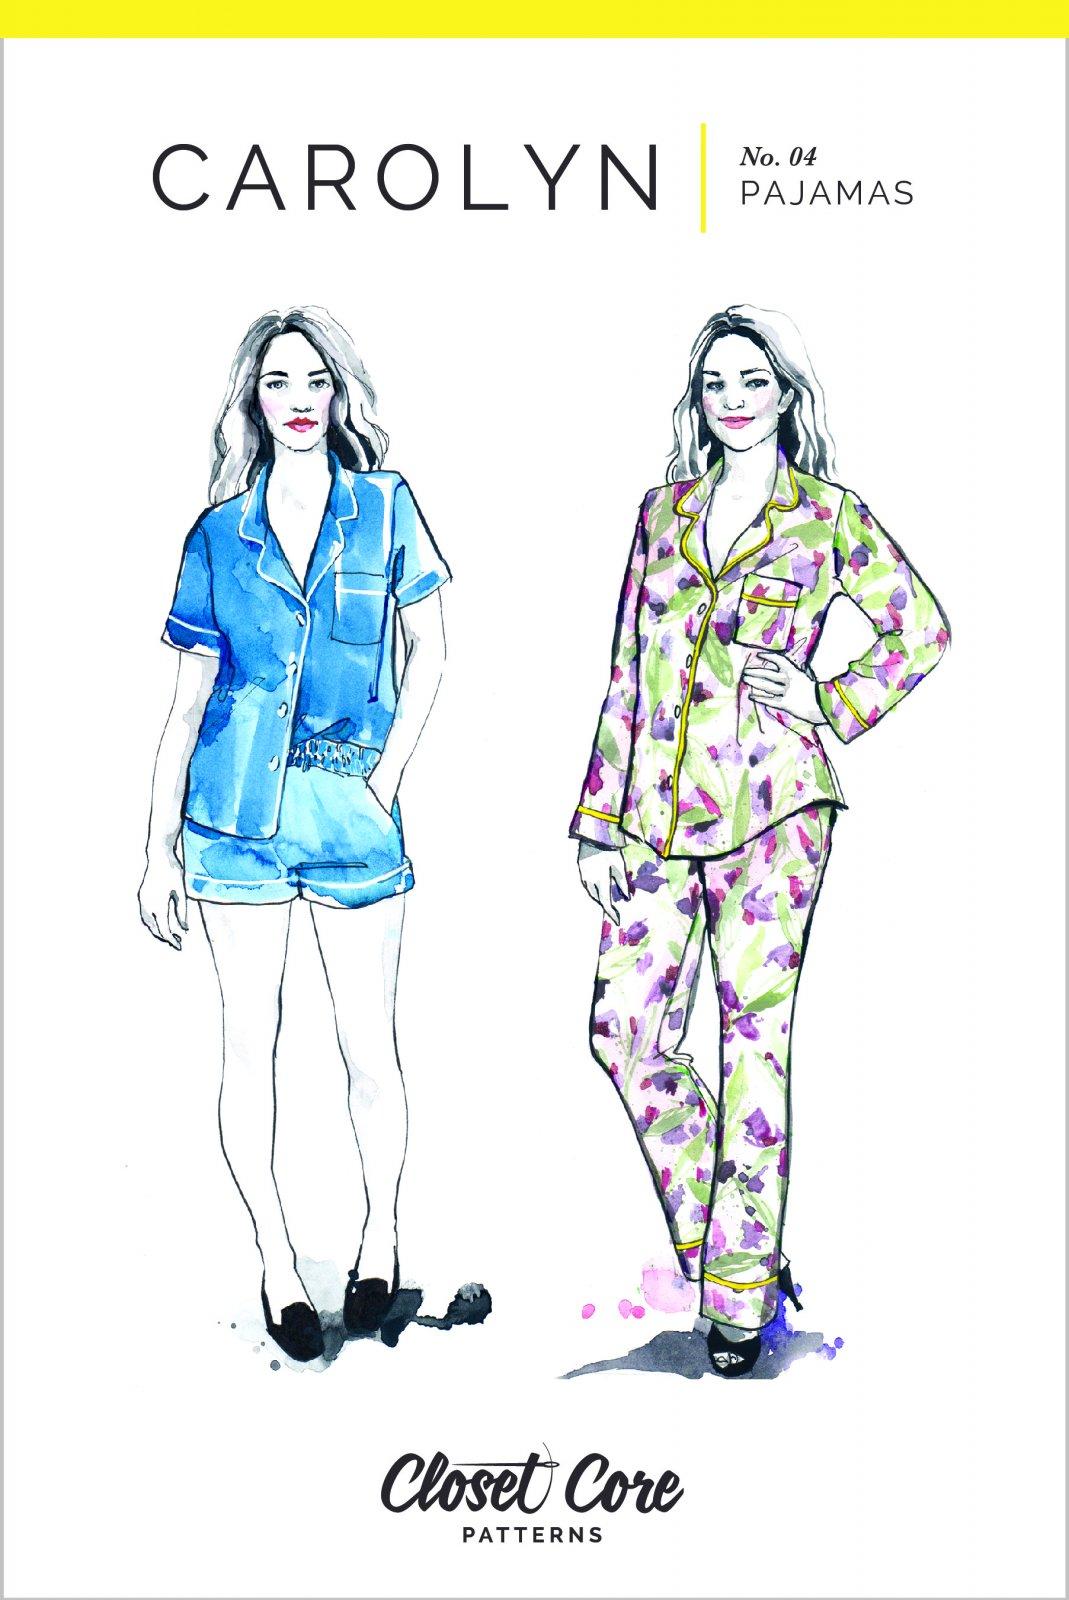 Carolyn Pajamas - Closet Core Patterns